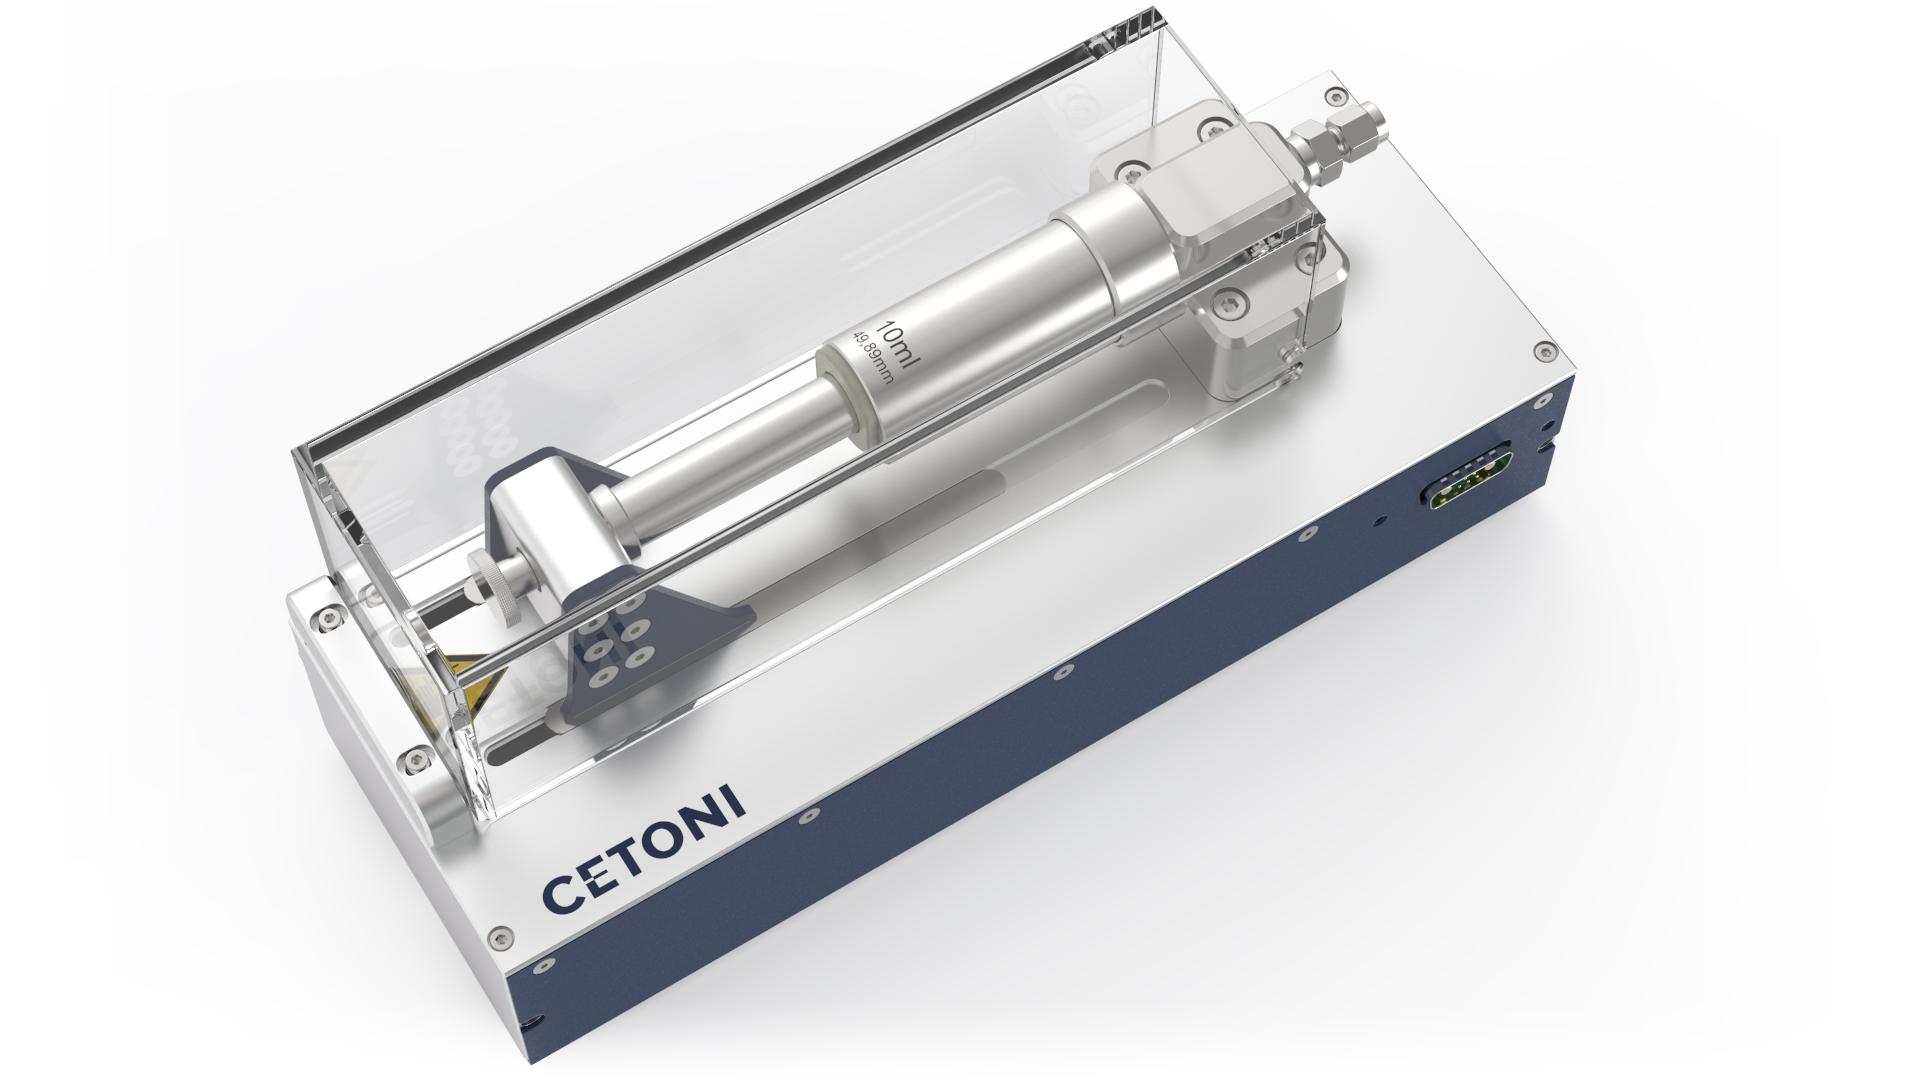 Nemesys Hochdruckmodul, syringe pump Nemesys high pressure